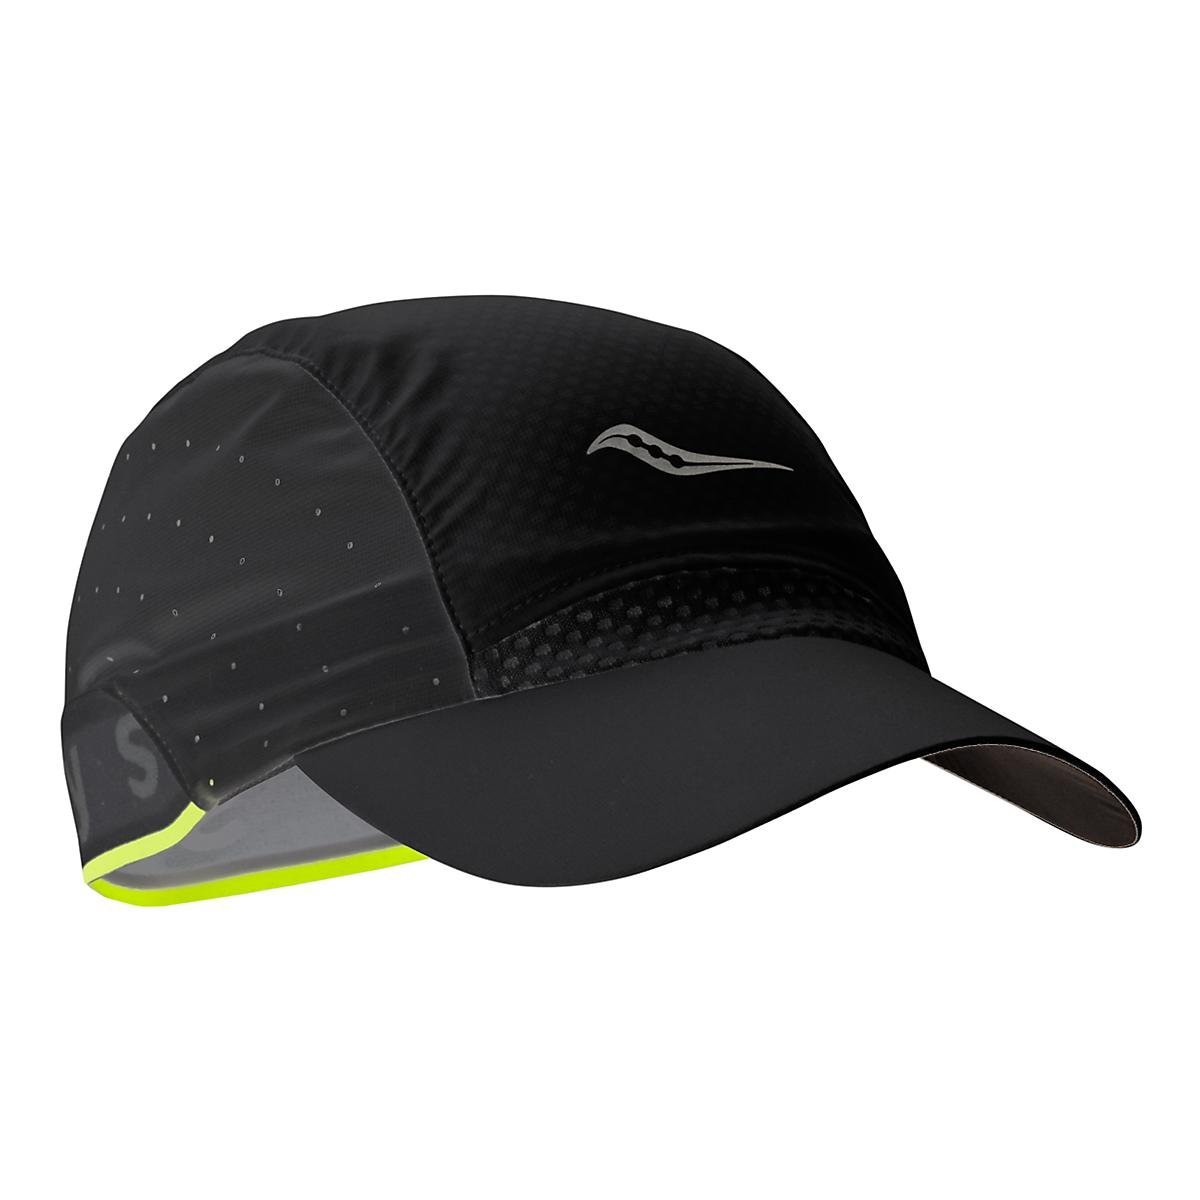 6b82dce2b92 Saucony Speed Run Cap Headwear at Road Runner Sports